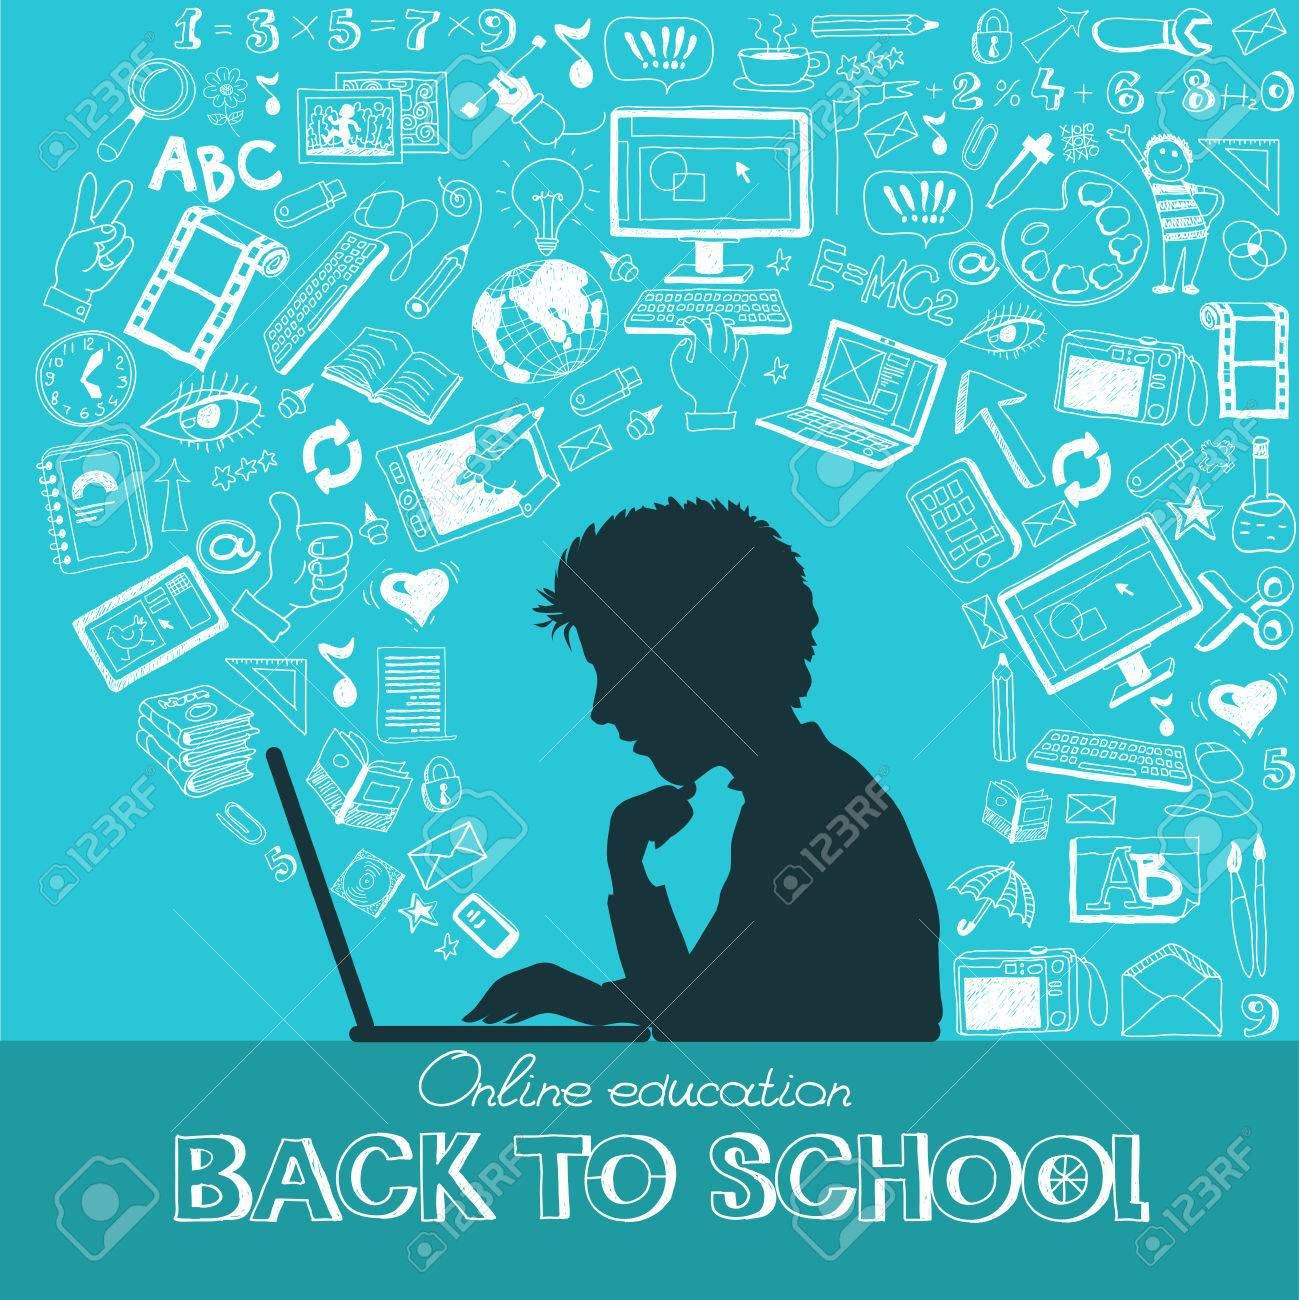 Back to school - doodle set, colored icons flat. Standard-Bild - 46202919